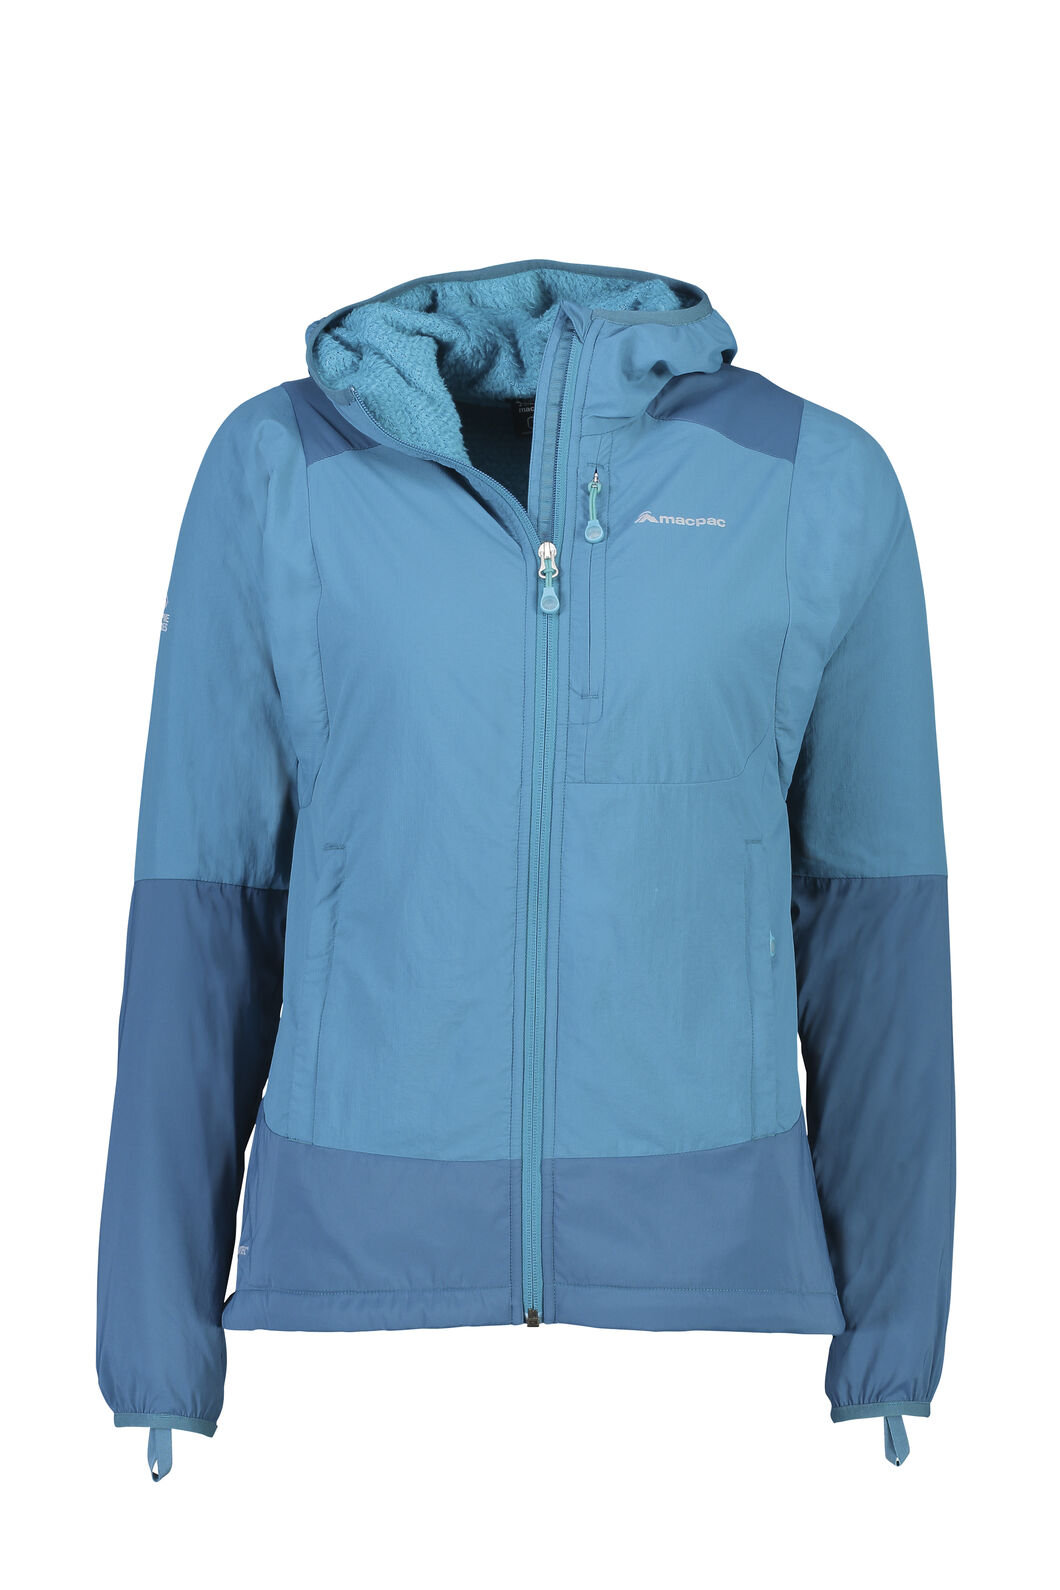 Macpac Pisa Polartec® Hooded Jacket - Women's, Ocean Depths, hi-res